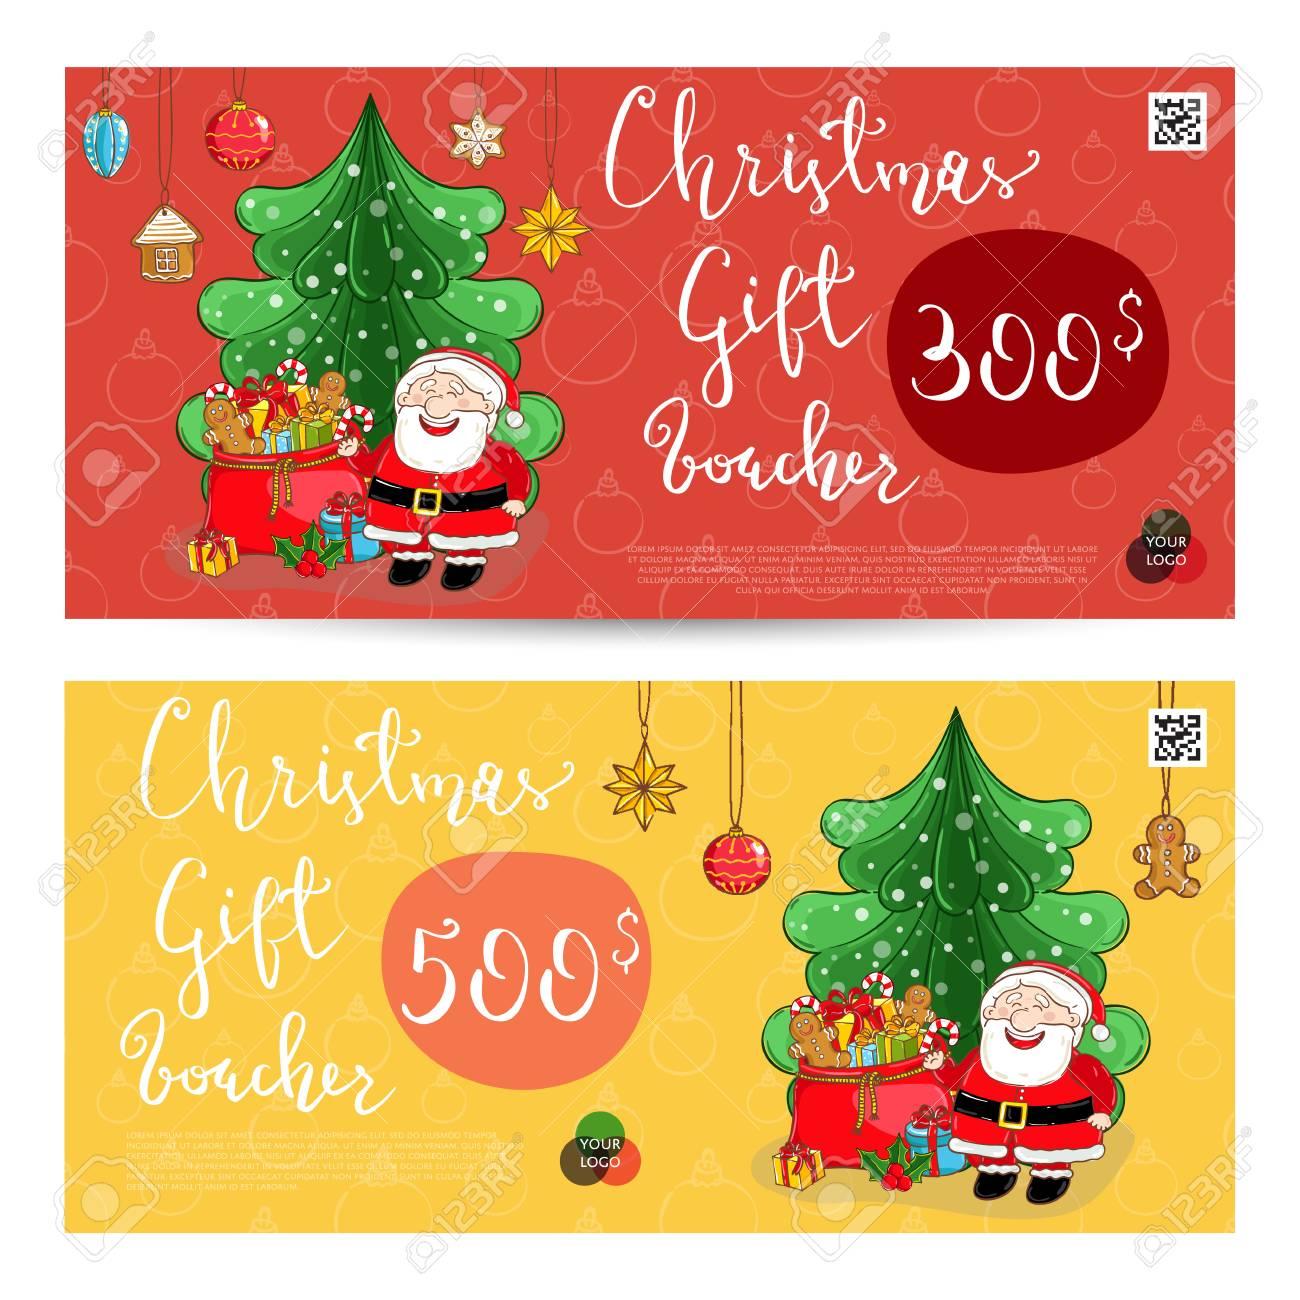 Christmas gift voucher template gift coupon with xmas attributes christmas gift voucher template gift coupon with xmas attributes and prepaid sum santa yadclub Choice Image